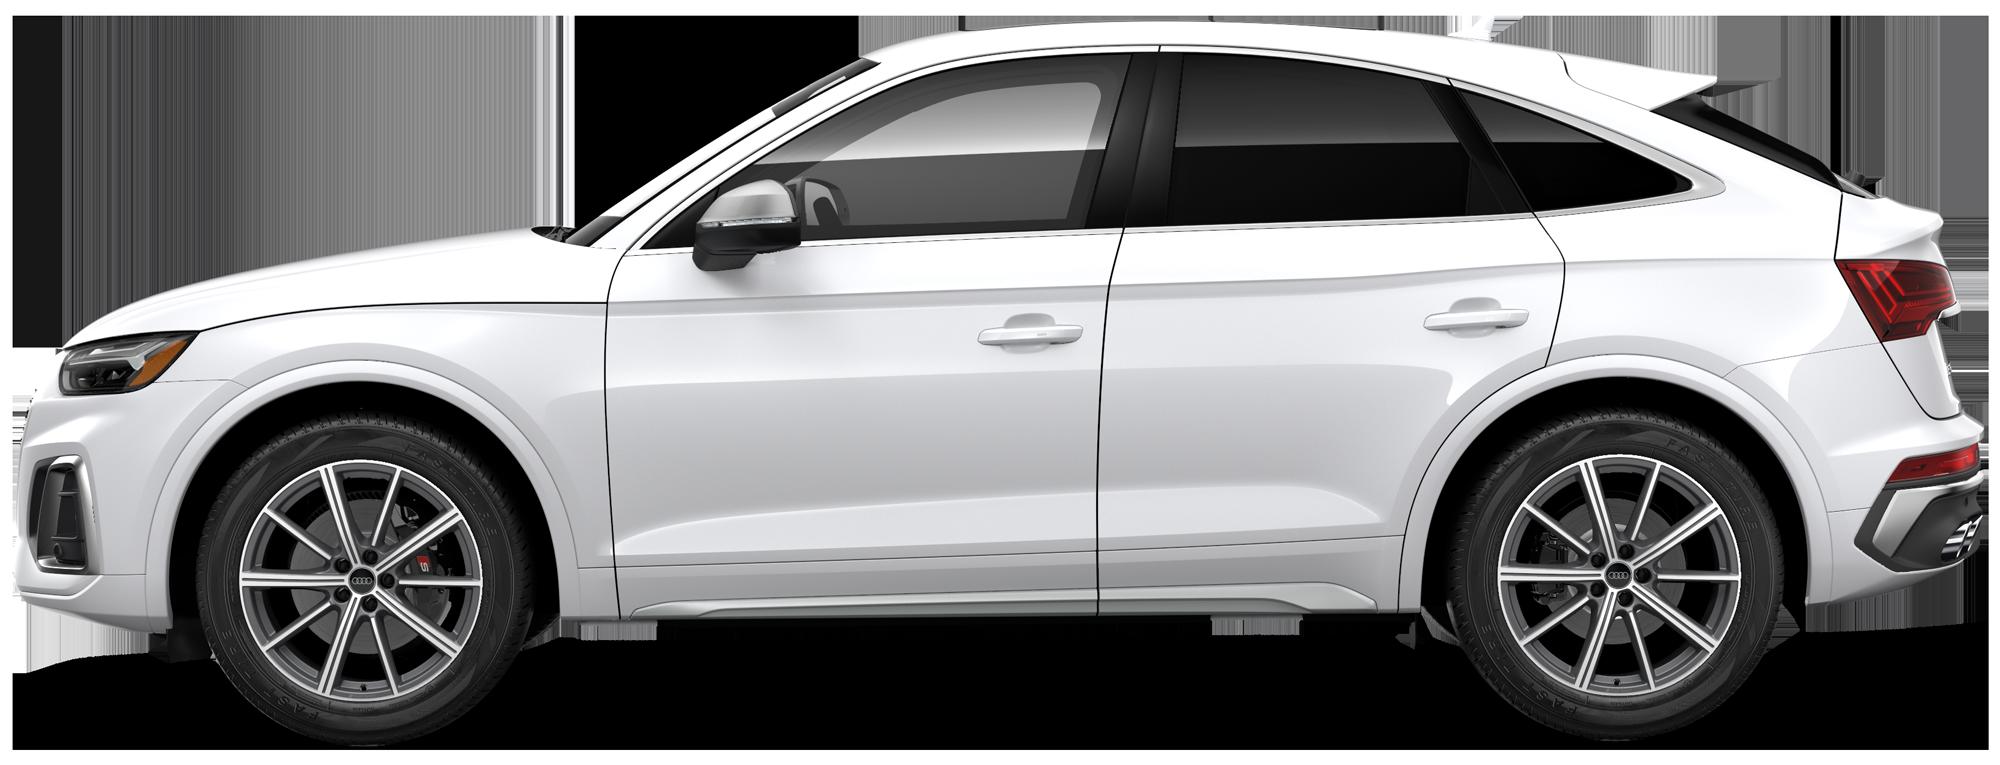 2021 Audi SQ5 Sportback SUV 3.0T Premium